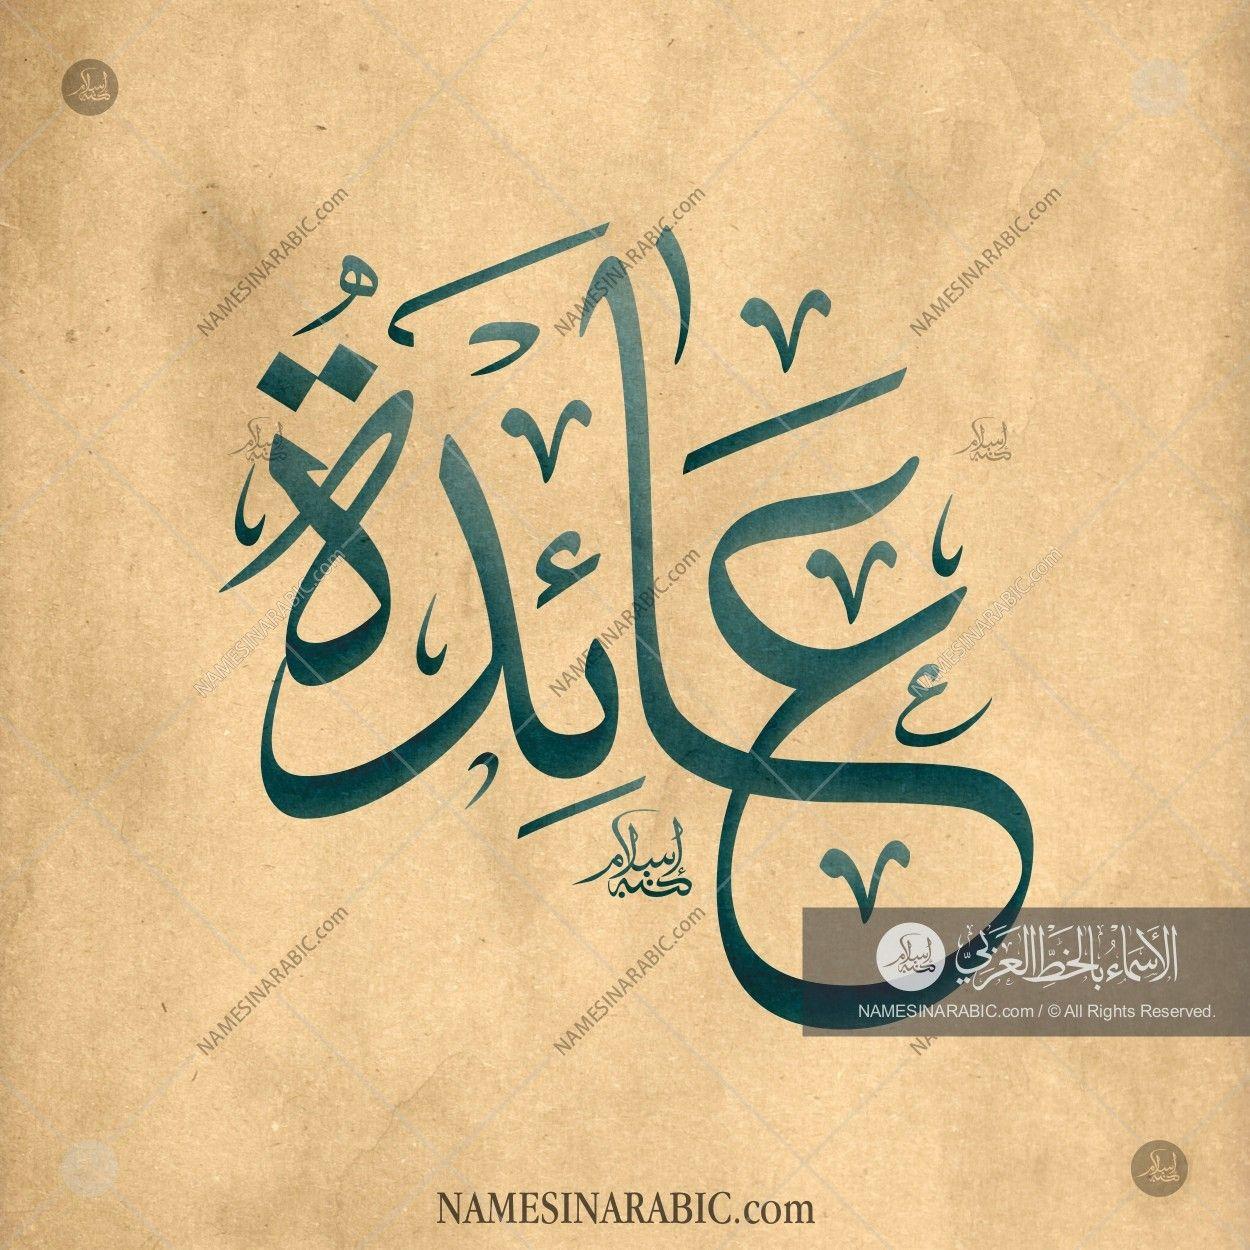 Aidah عائدة Names In Arabic Calligraphy Name 3228 Arabic Calligraphy Art Arabic Calligraphy